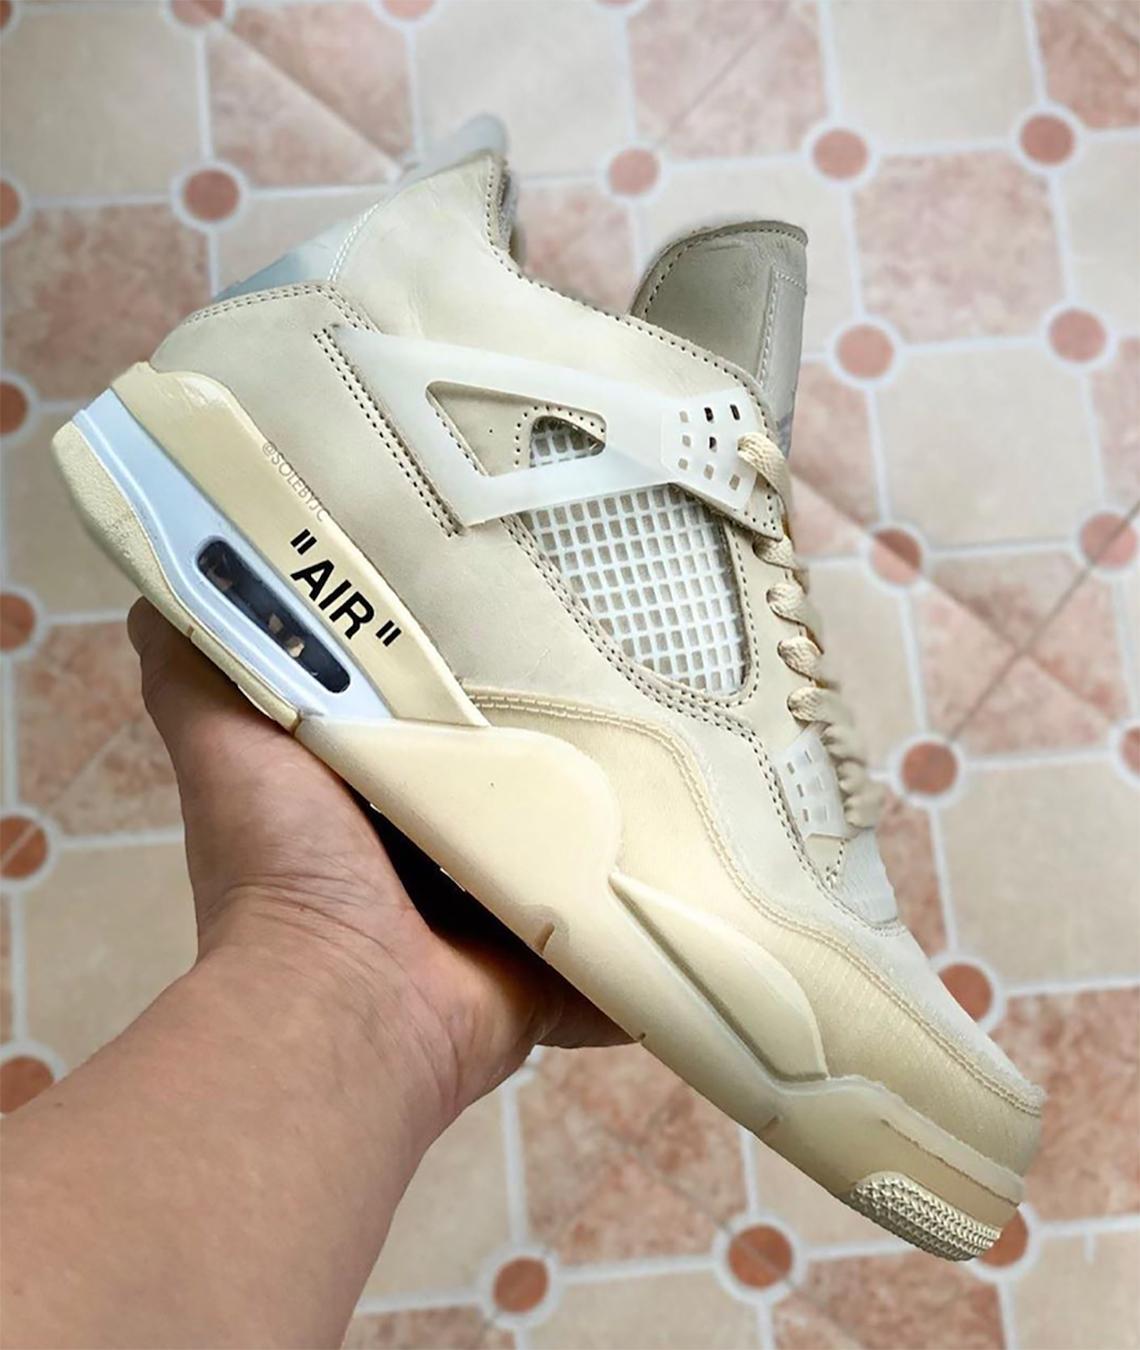 infraestructura parque principal  Off-White Air Jordan 4 Sail CV9388-100 | SneakerNews.com